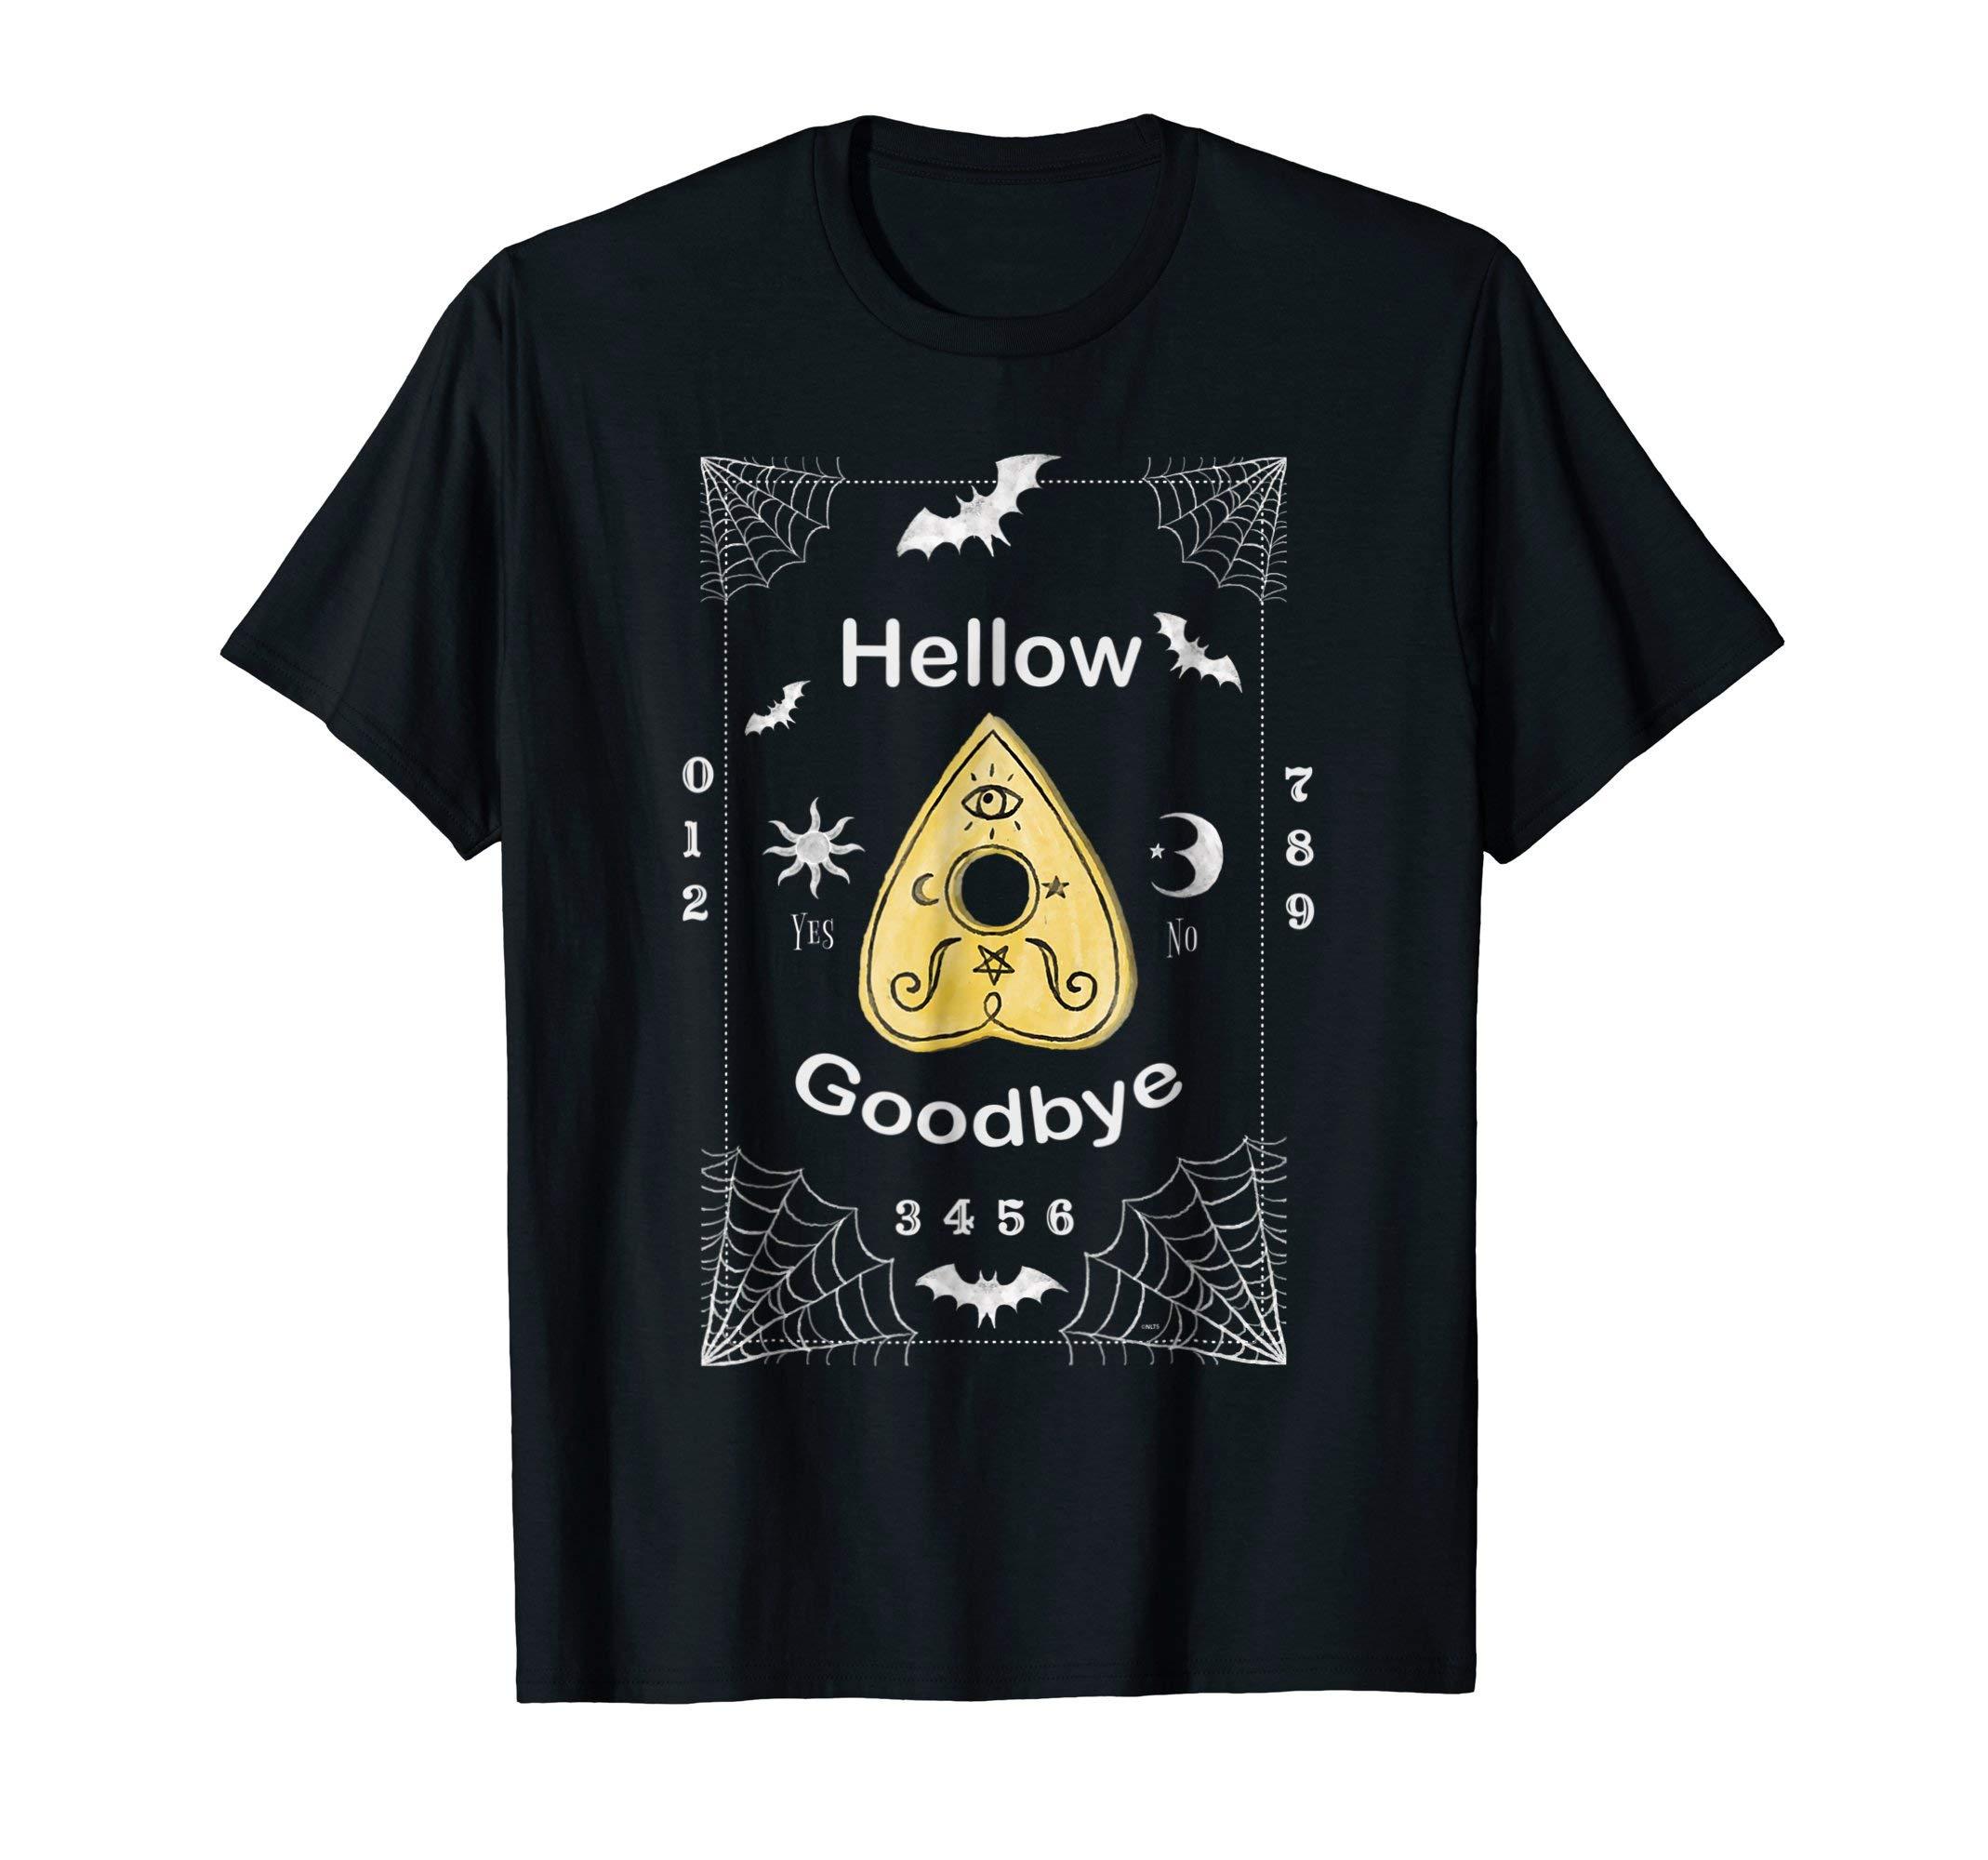 Ouija-board-Halloween-T-Shirt-Novelty-Shirt-Tee-Gifts